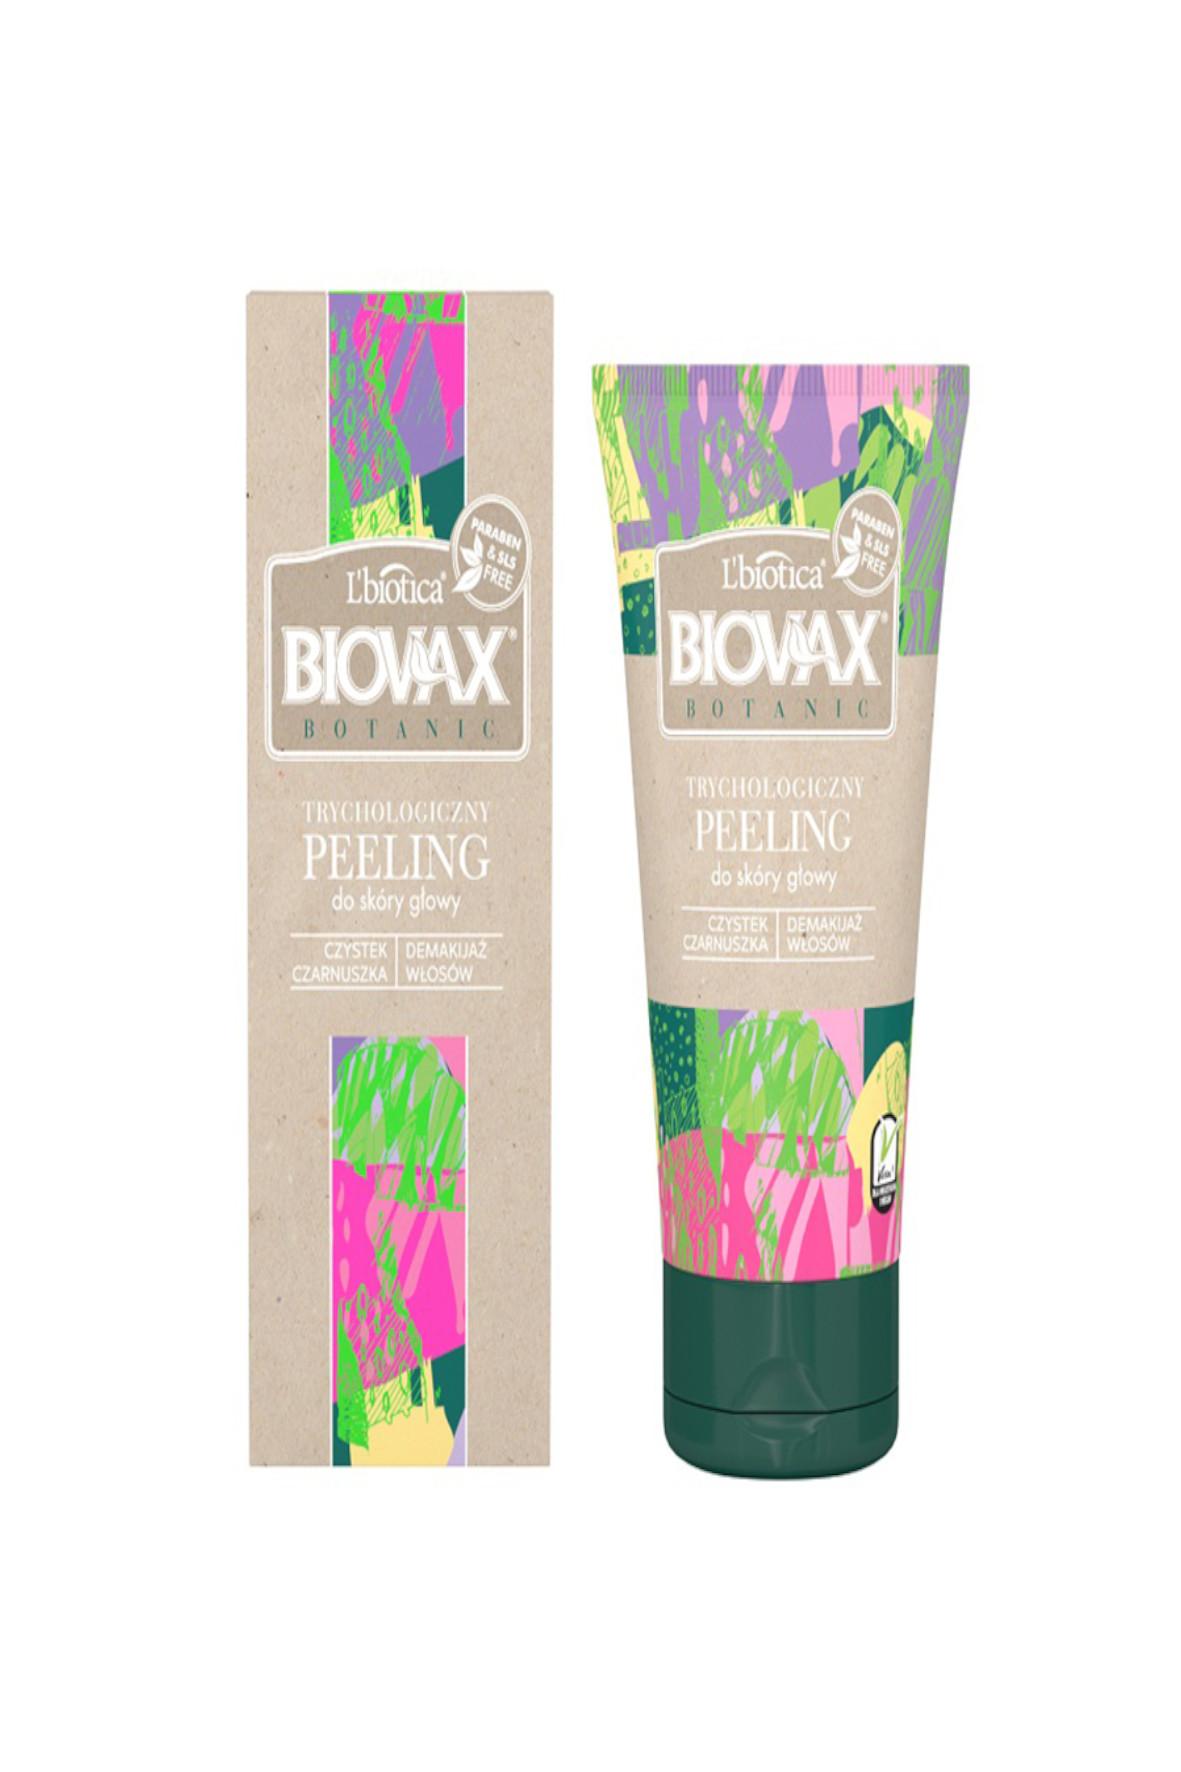 Biovax BOTANIC Peeling do głowy 8Y40UN